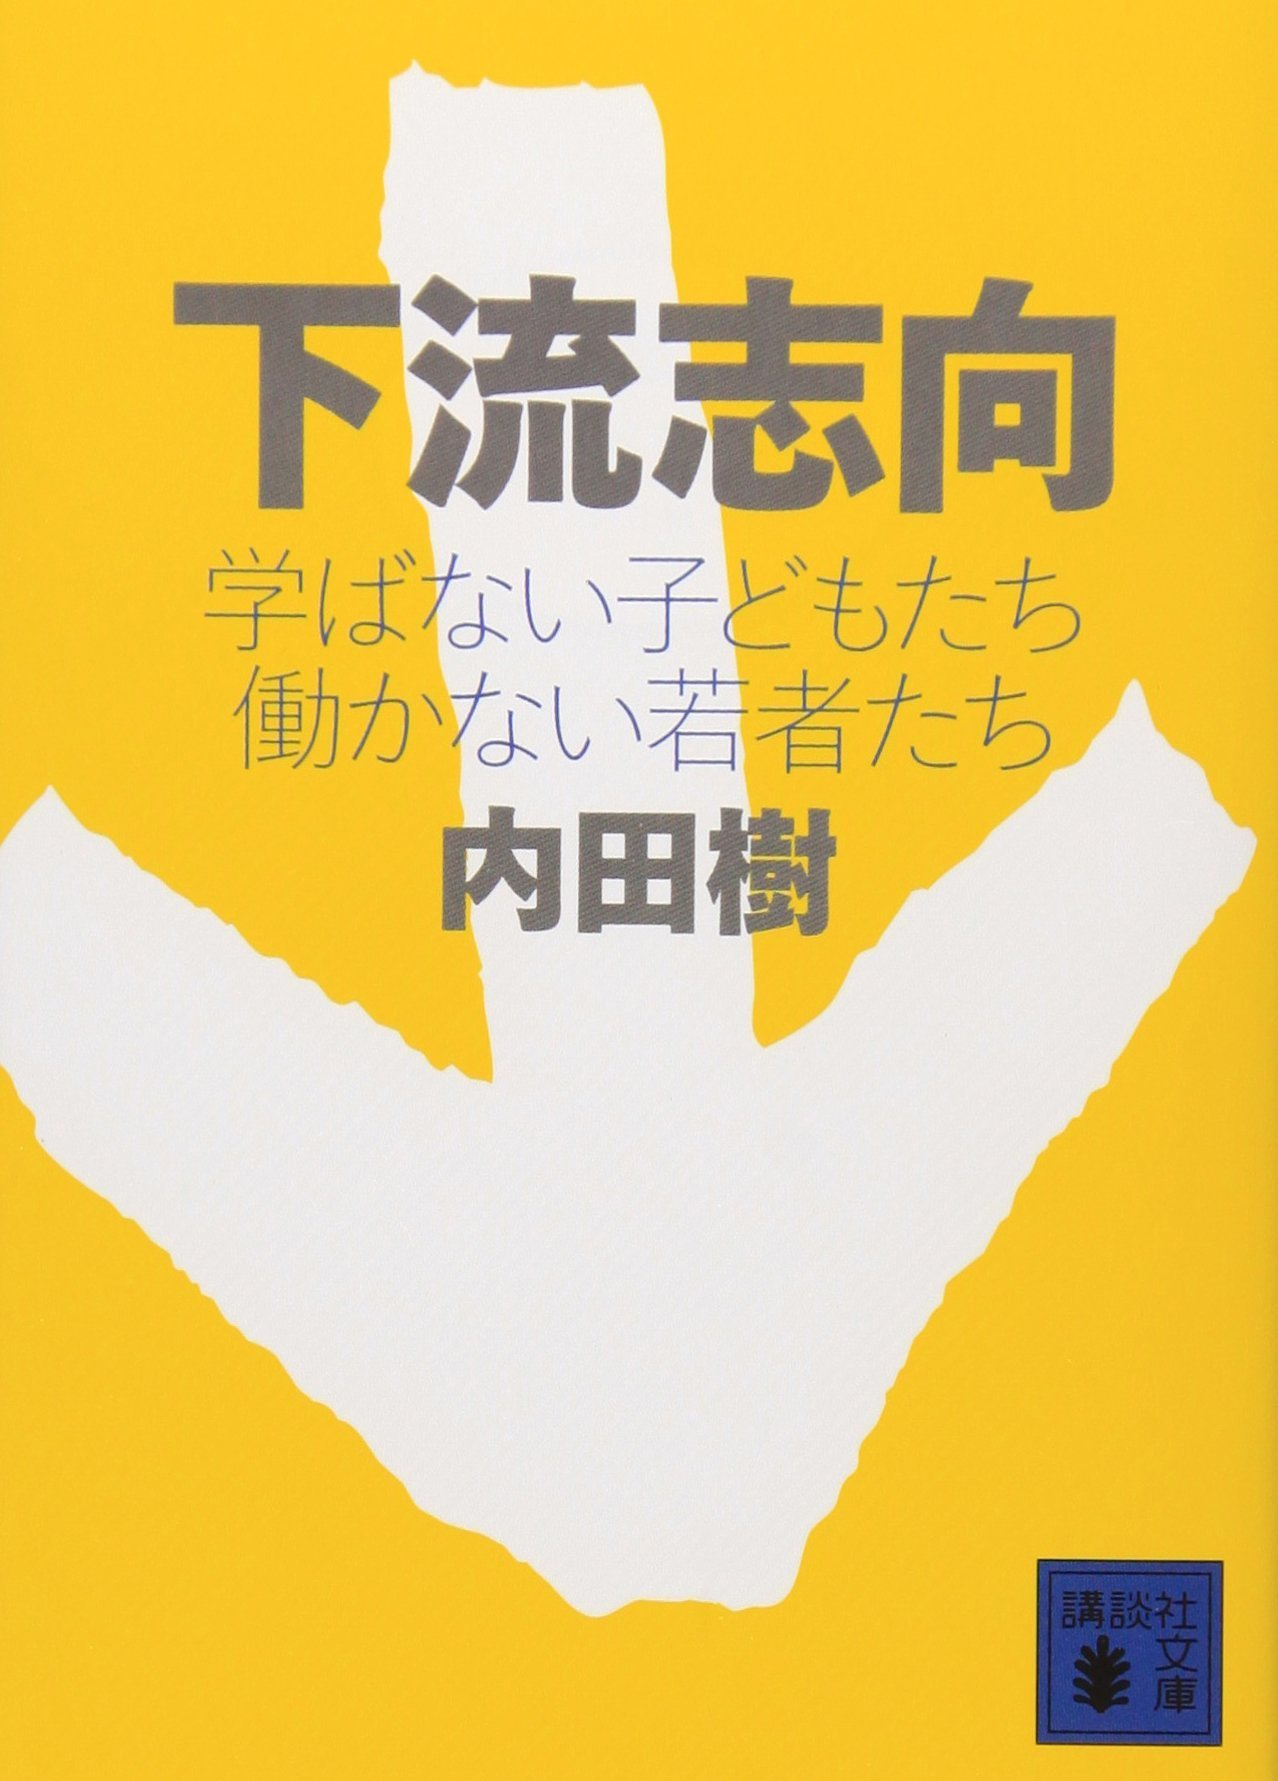 karyusikou.jpg